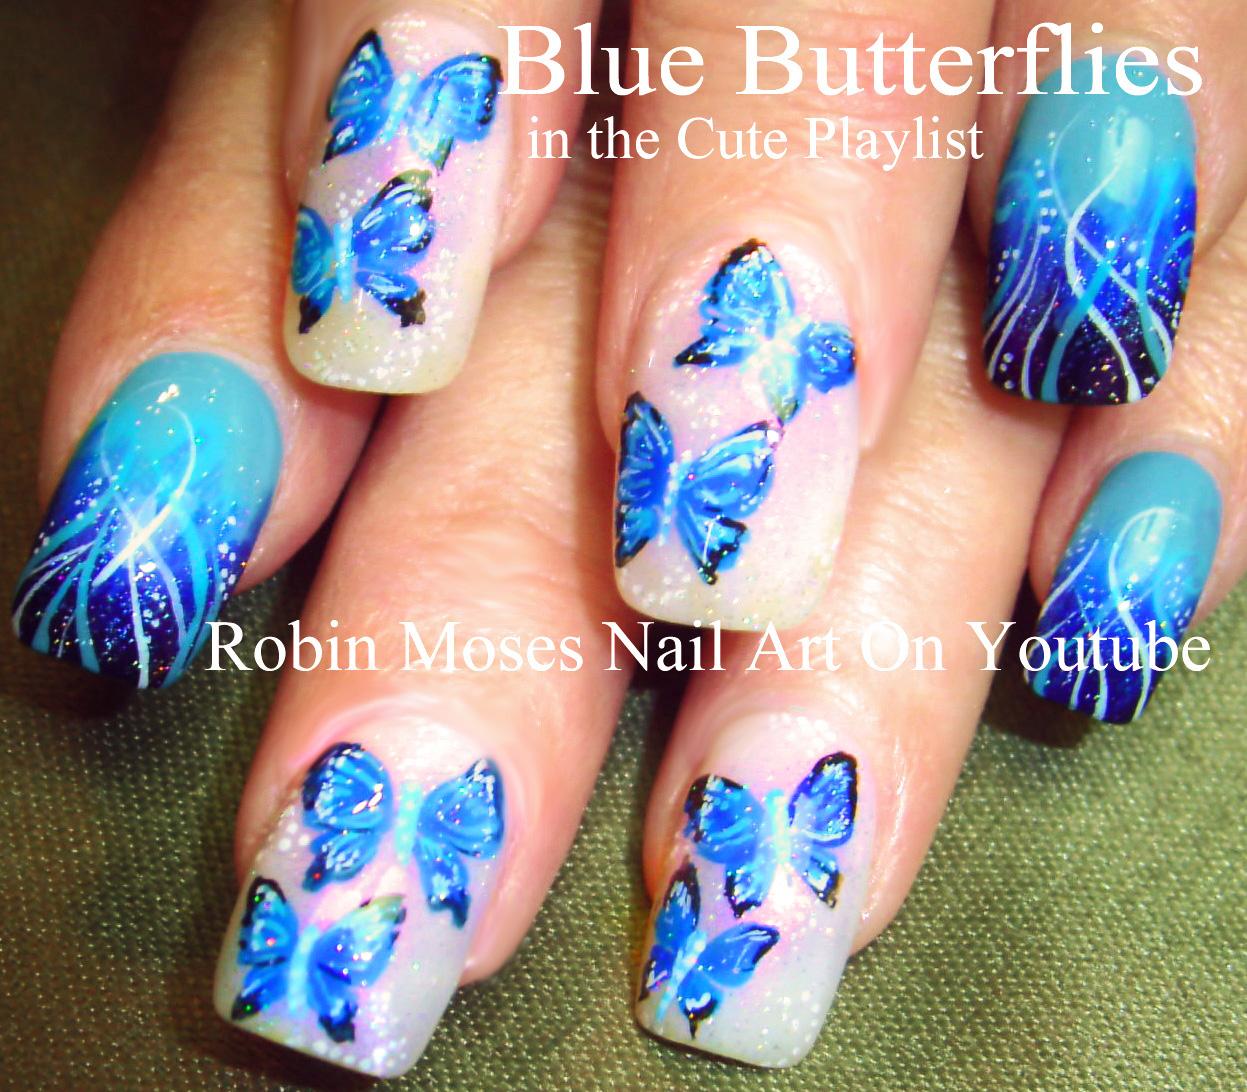 Robin Moses Nail Art Spring Butterfly Nail Art Design